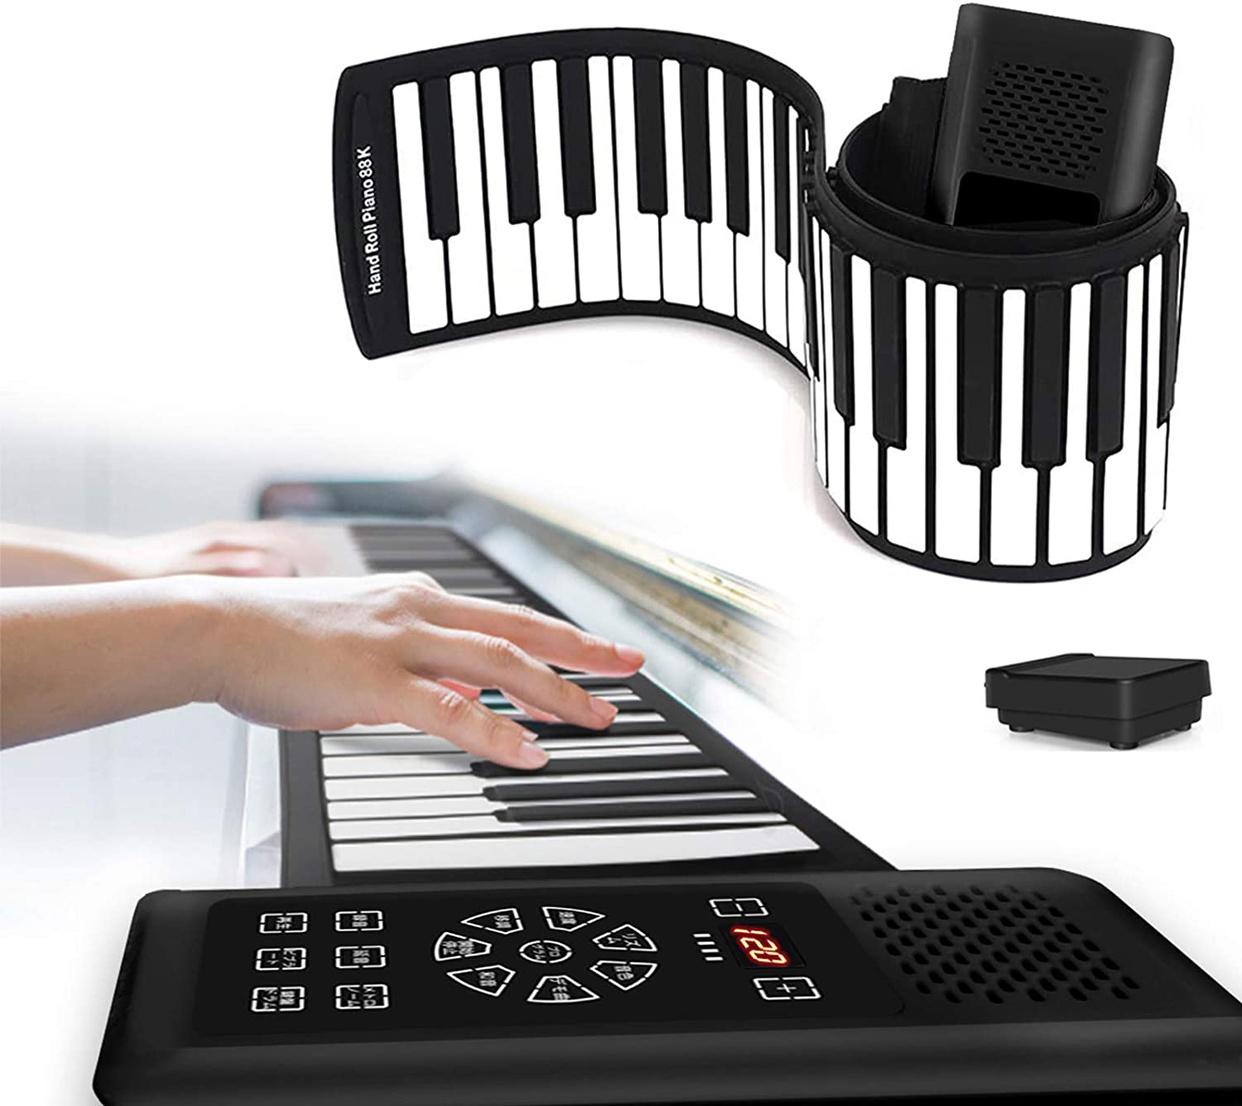 MOMOOLA(モモラ) ロールアップピアノの商品画像